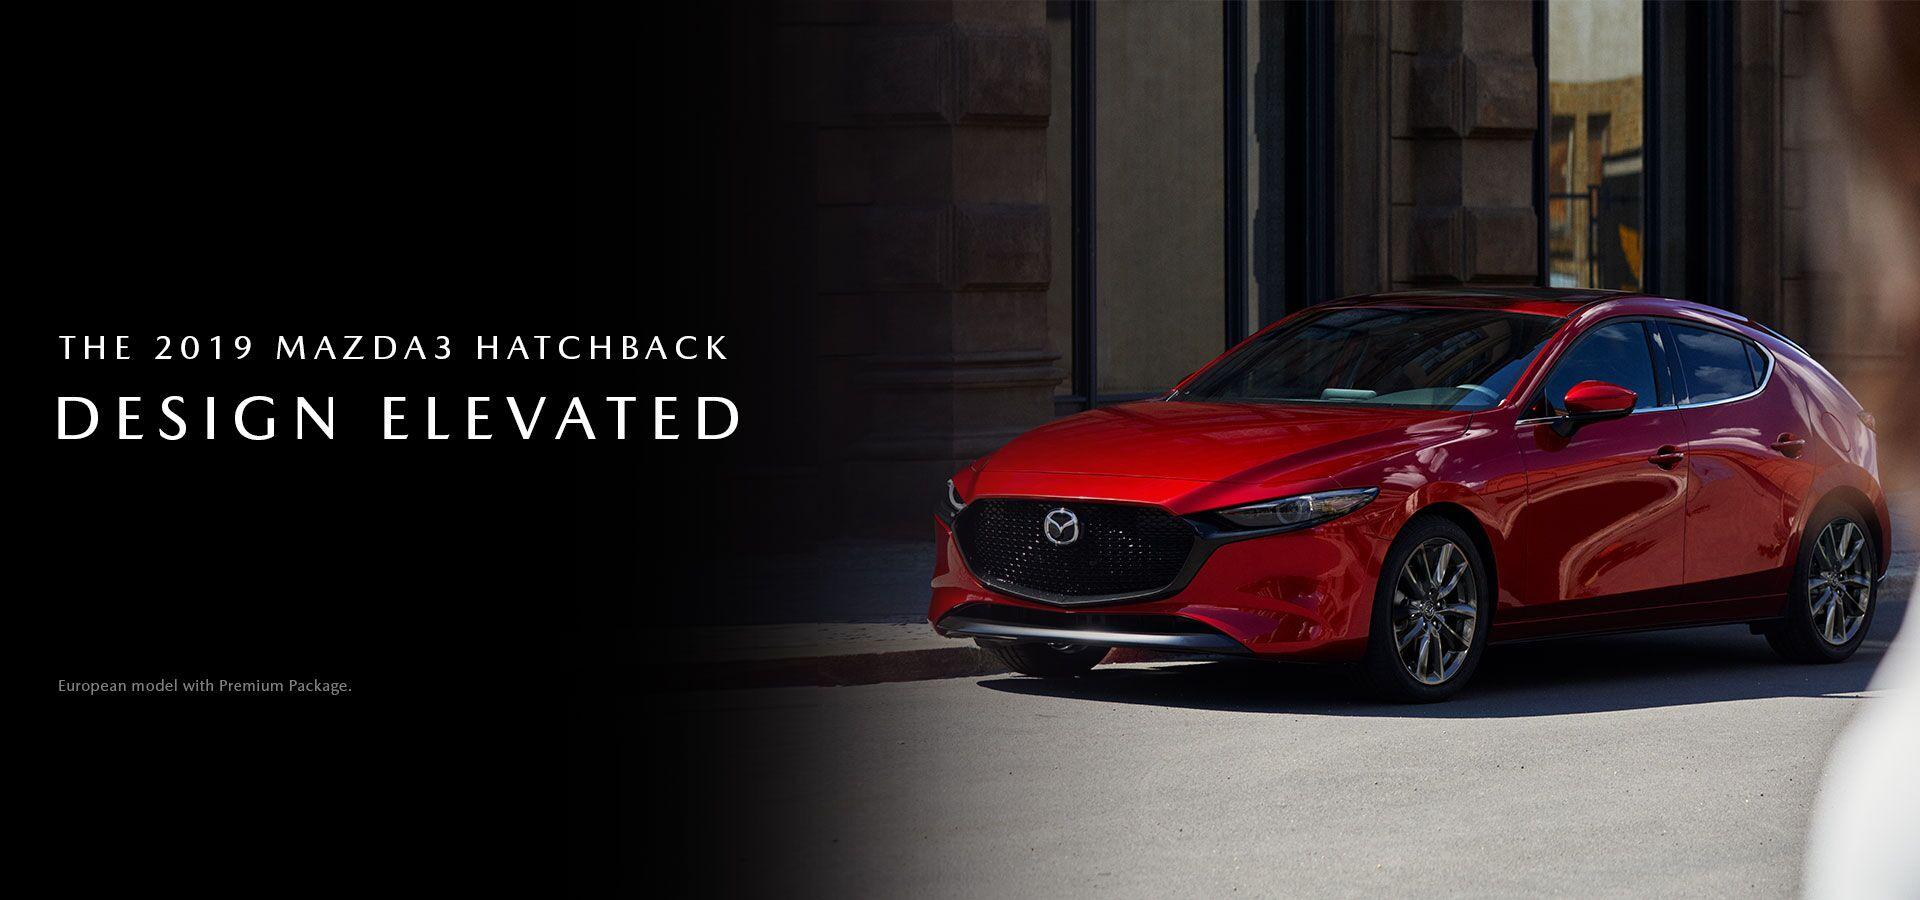 Bay Ridge Mazda >> Mazda Dealership Brooklyn NY Used Cars Bay Ridge Mazda